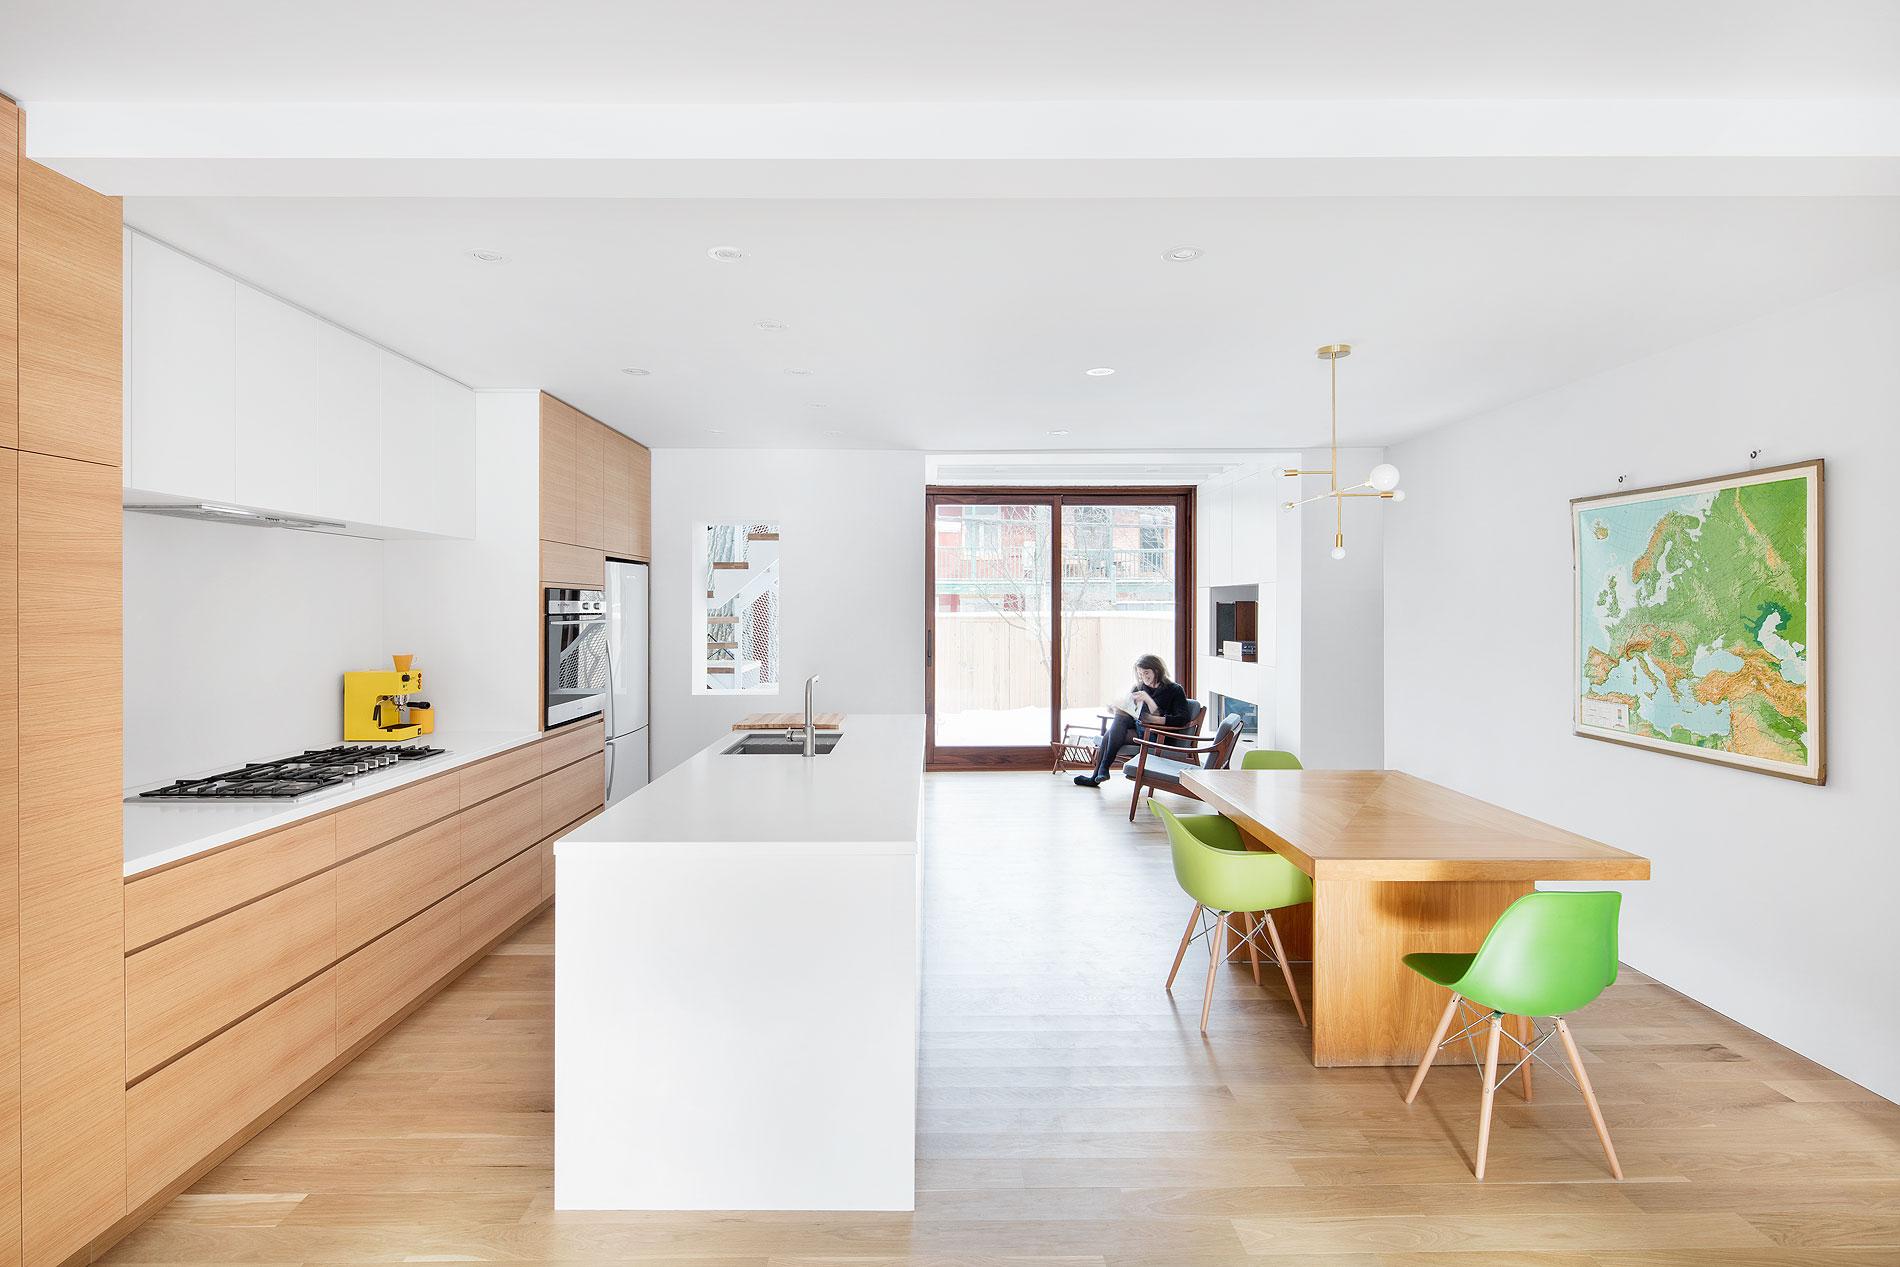 hotel-de-ville-residence-architecture-microclimat (2)